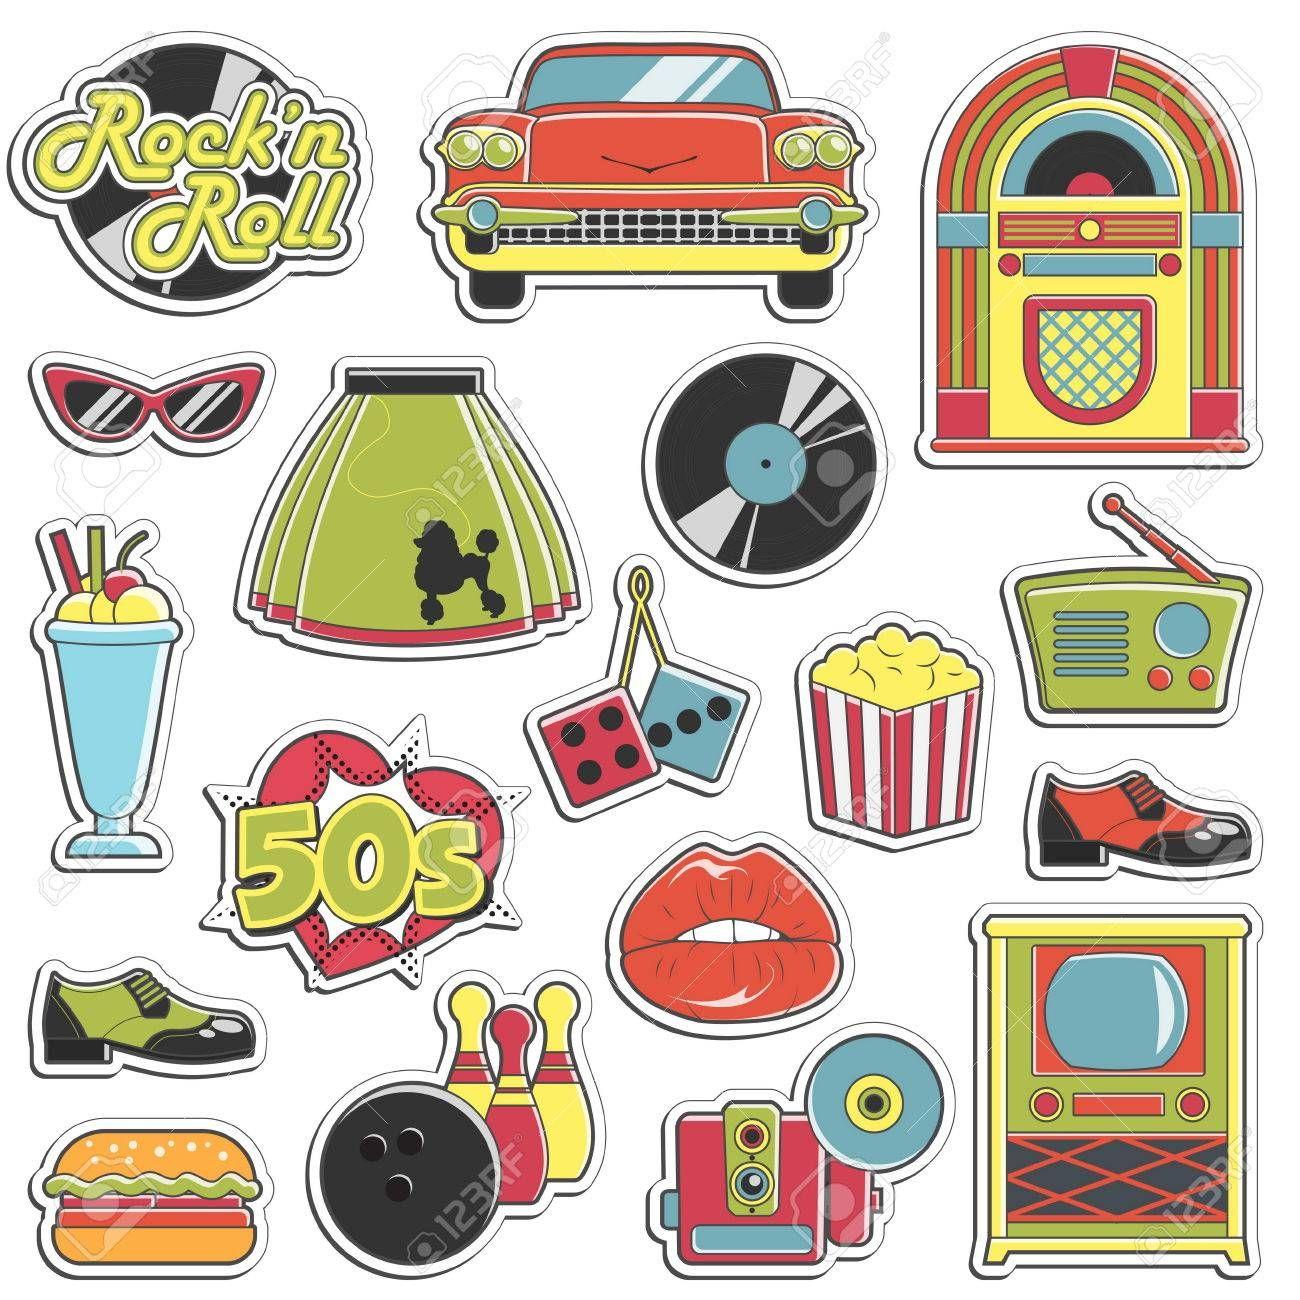 Printable Vintage Travel Stickers Super Coloring Travel Stickers Sticker Paper Crafts Travel Stickers Printable